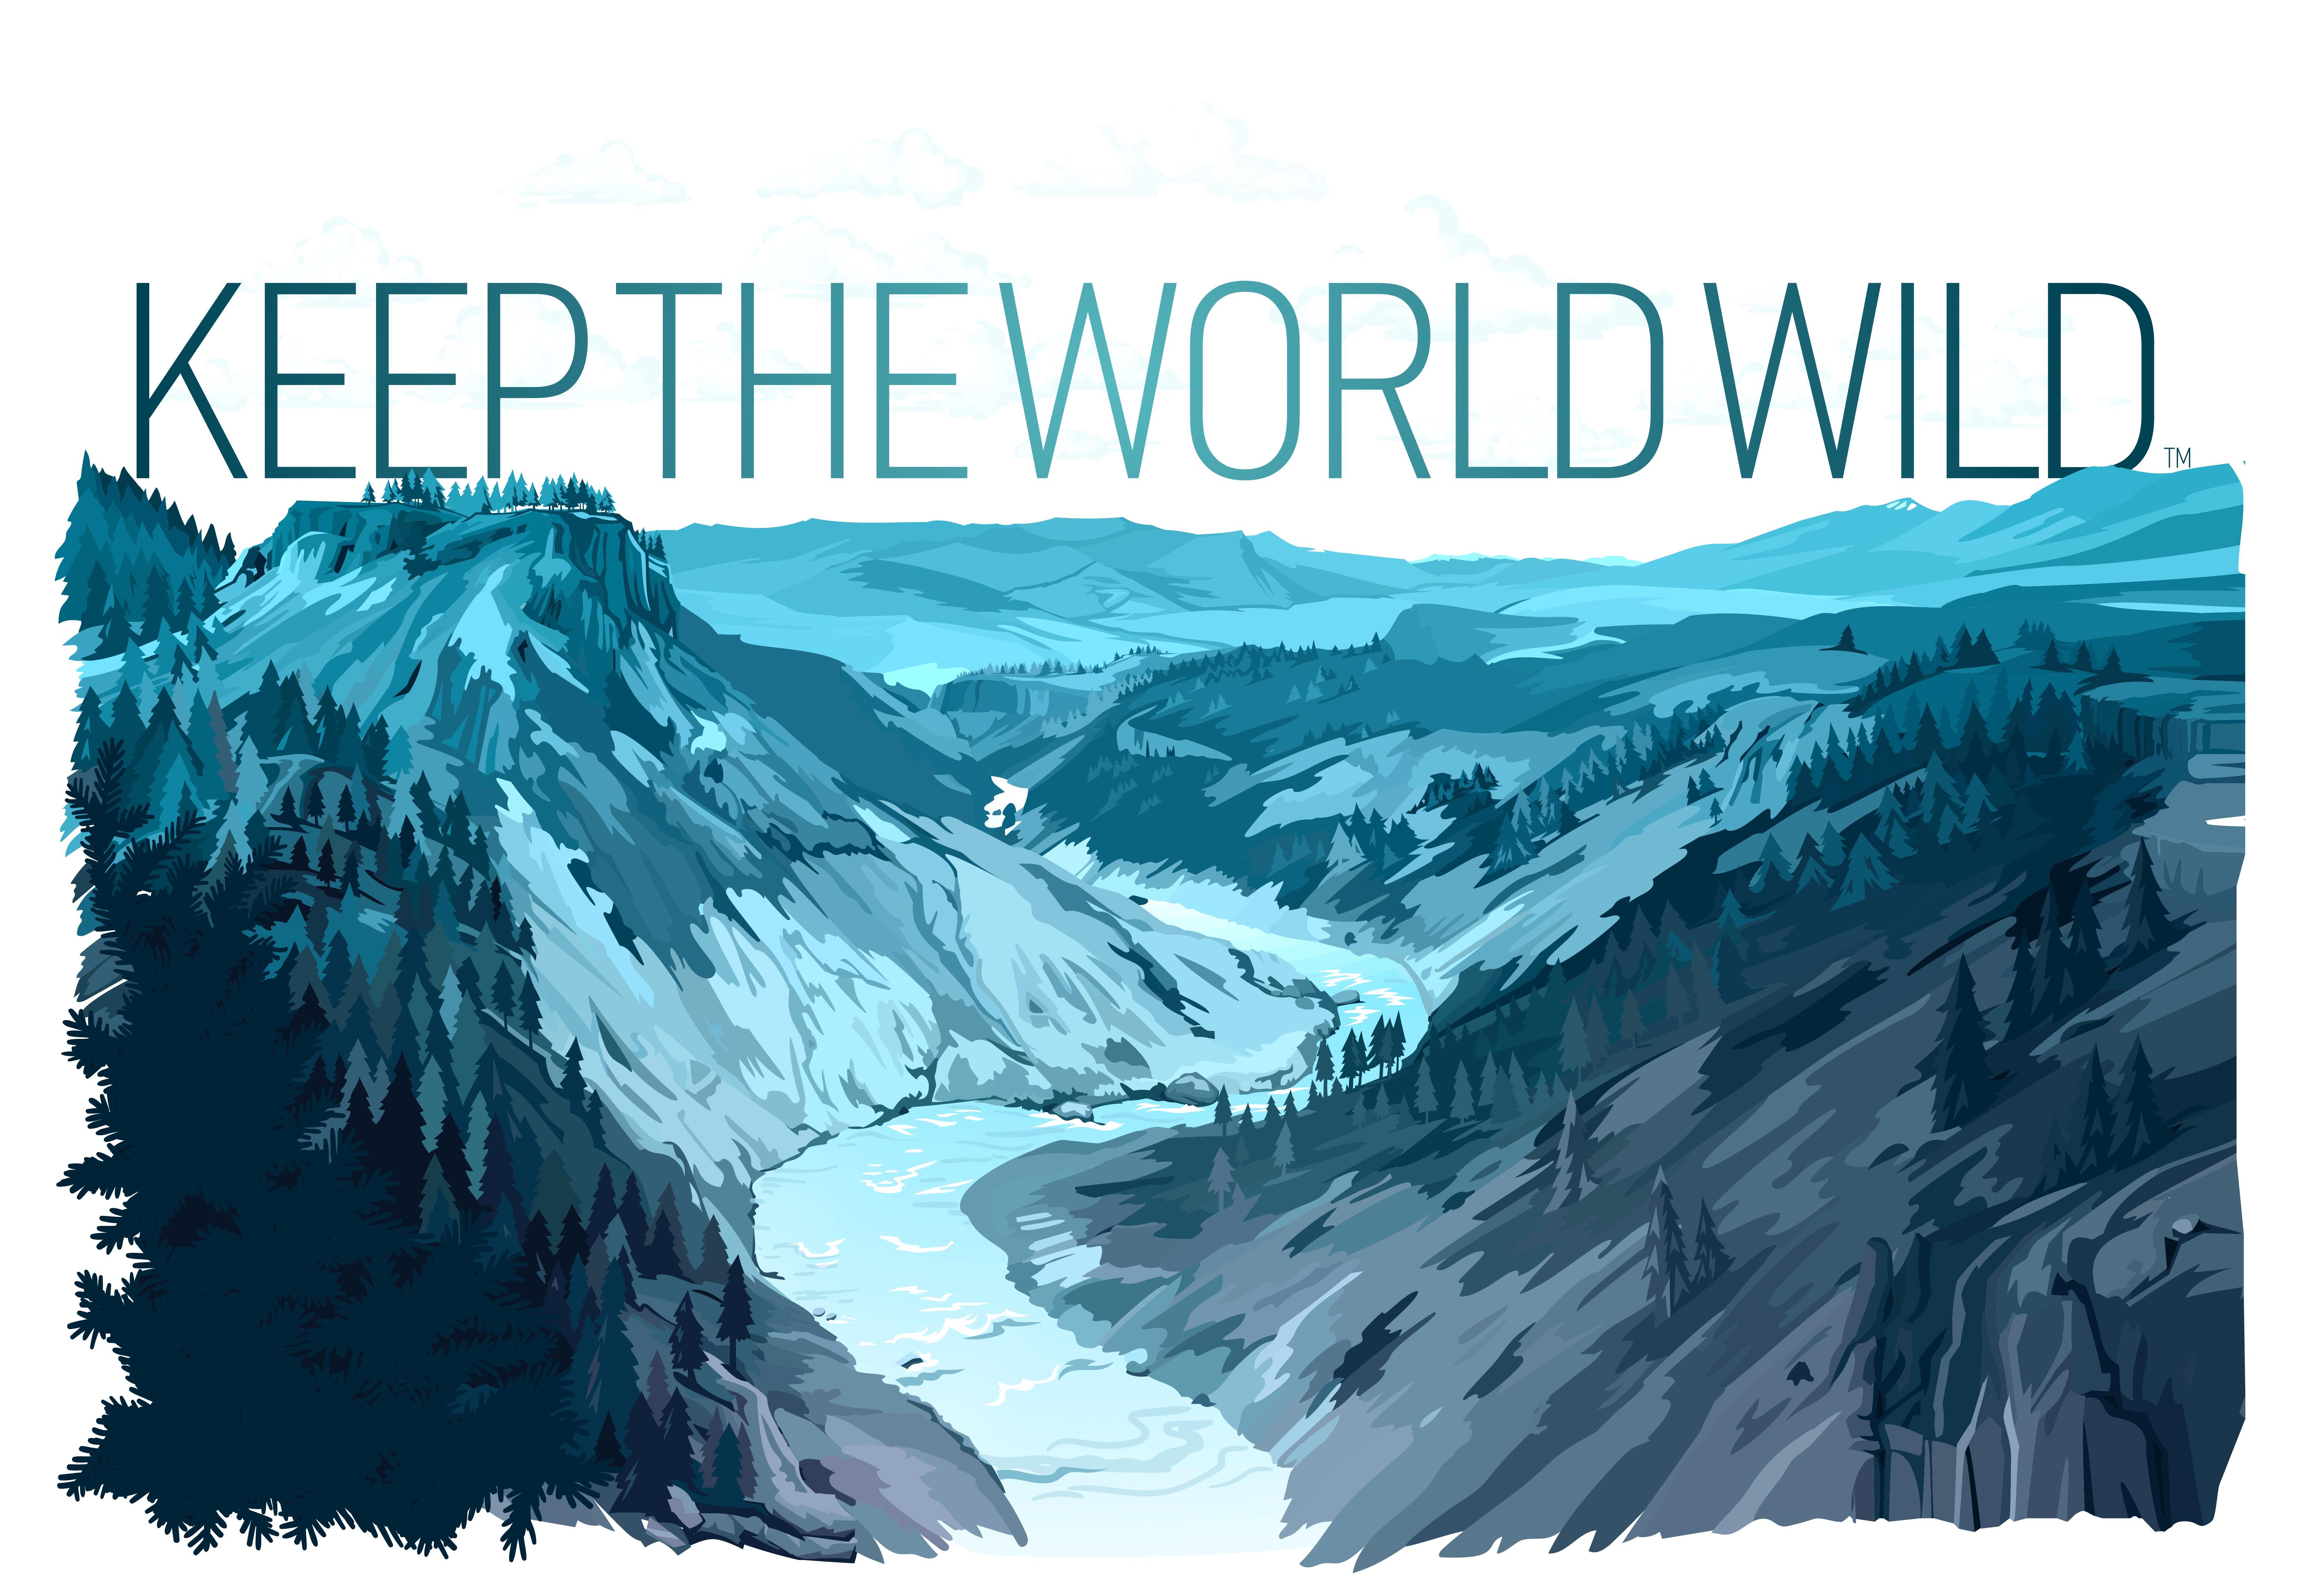 Keep The World Wild tee-shirt designs